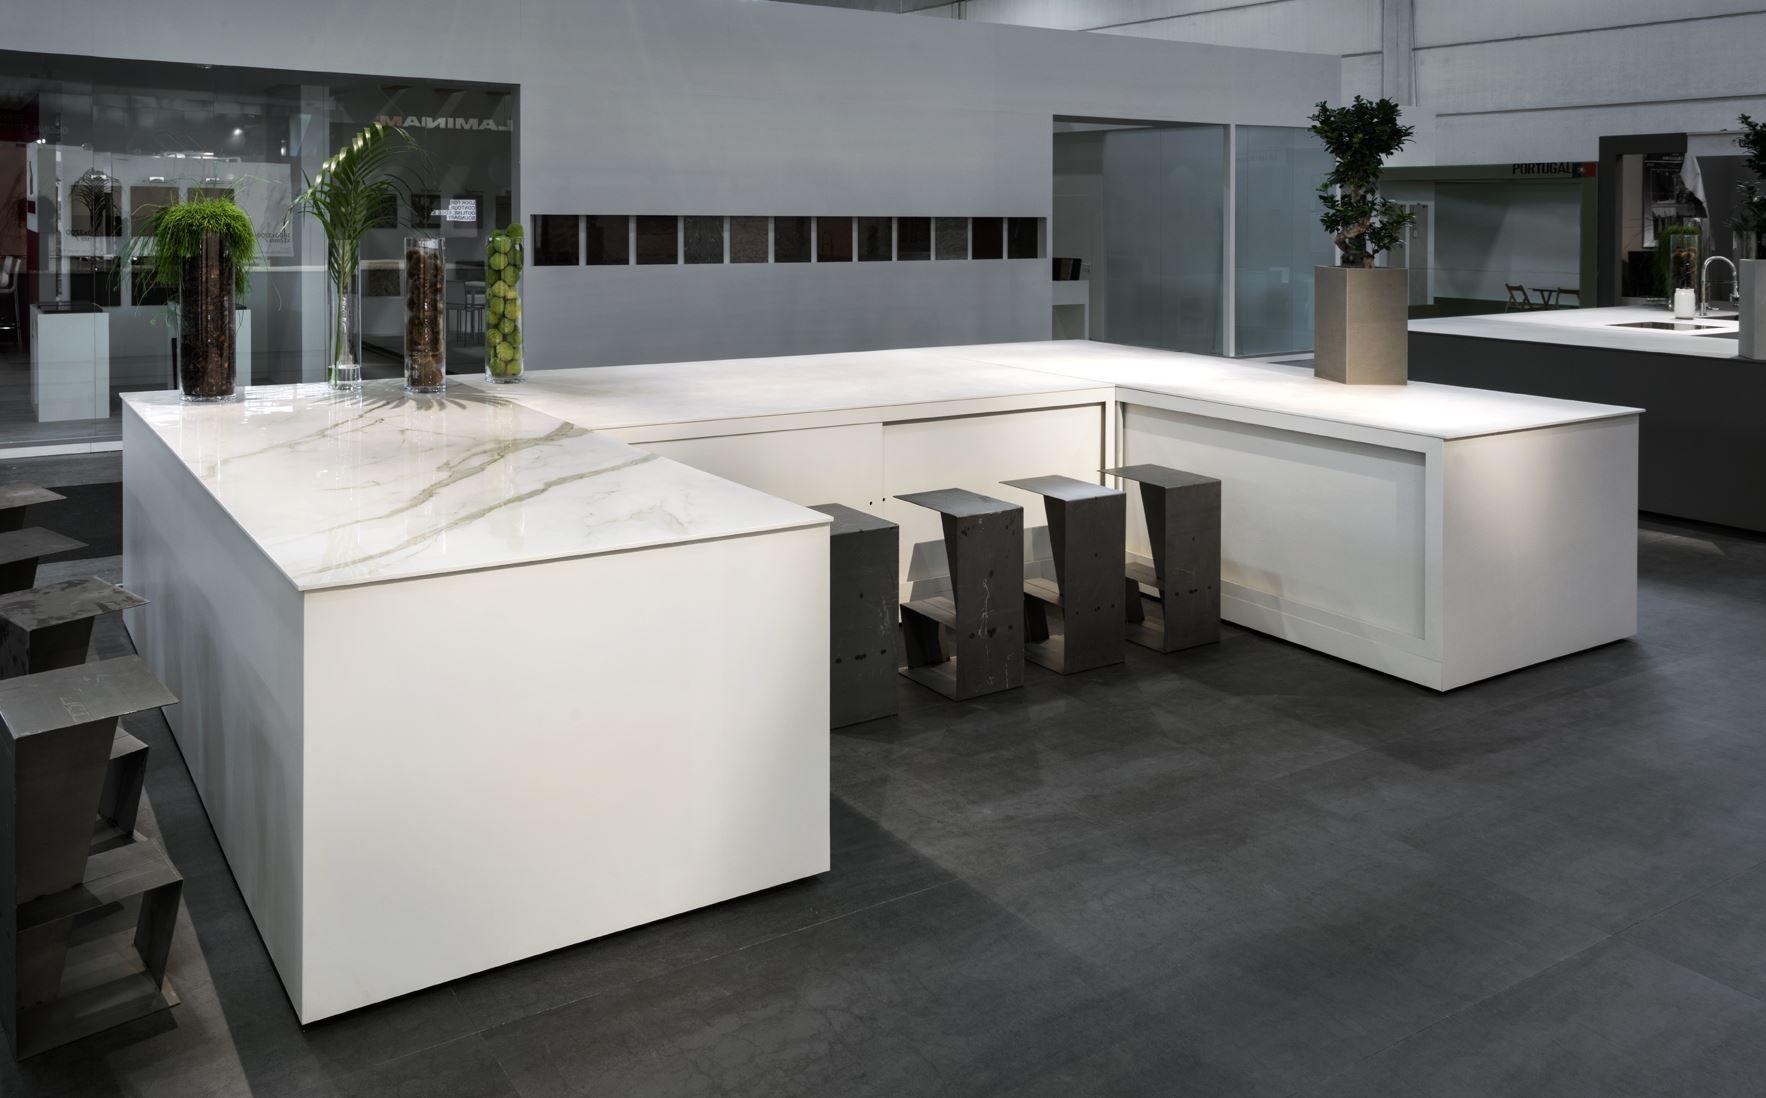 Laminam product stone tile kitchen stone tiles tiles calacatta oro - Top cucina stone ...